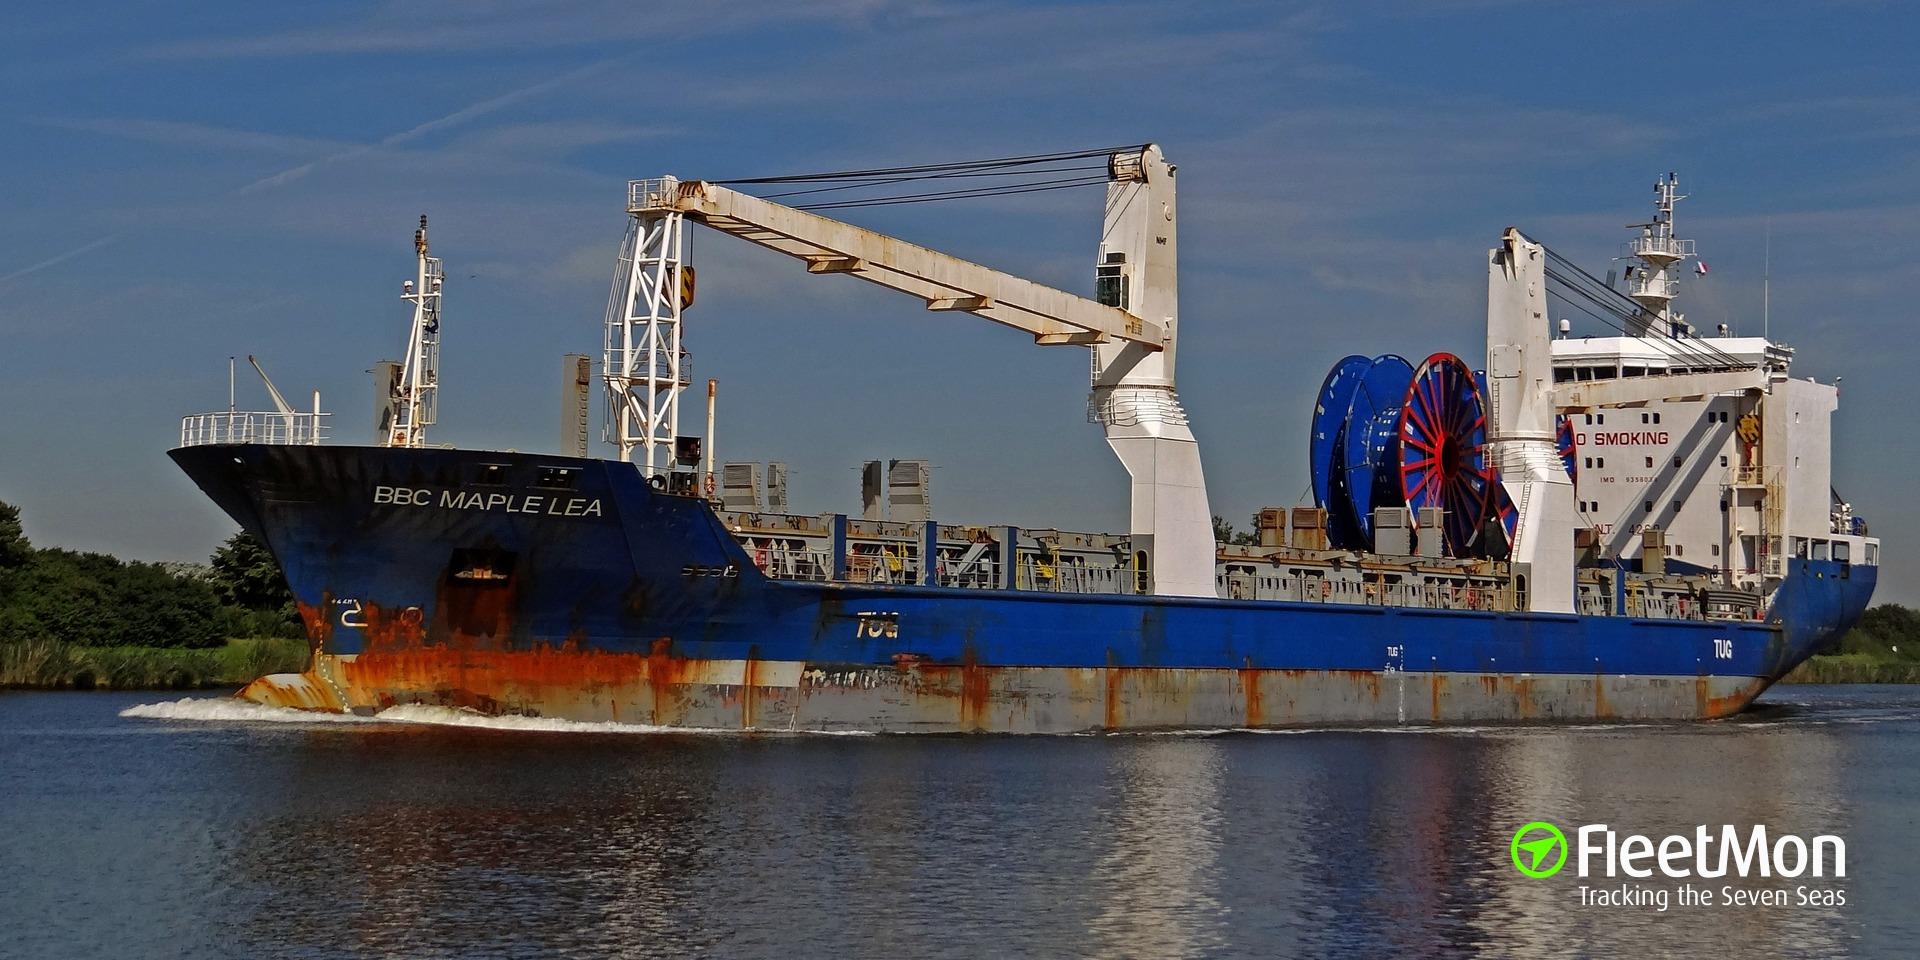 General cargo vessel BBC MAPLE LEA grounding